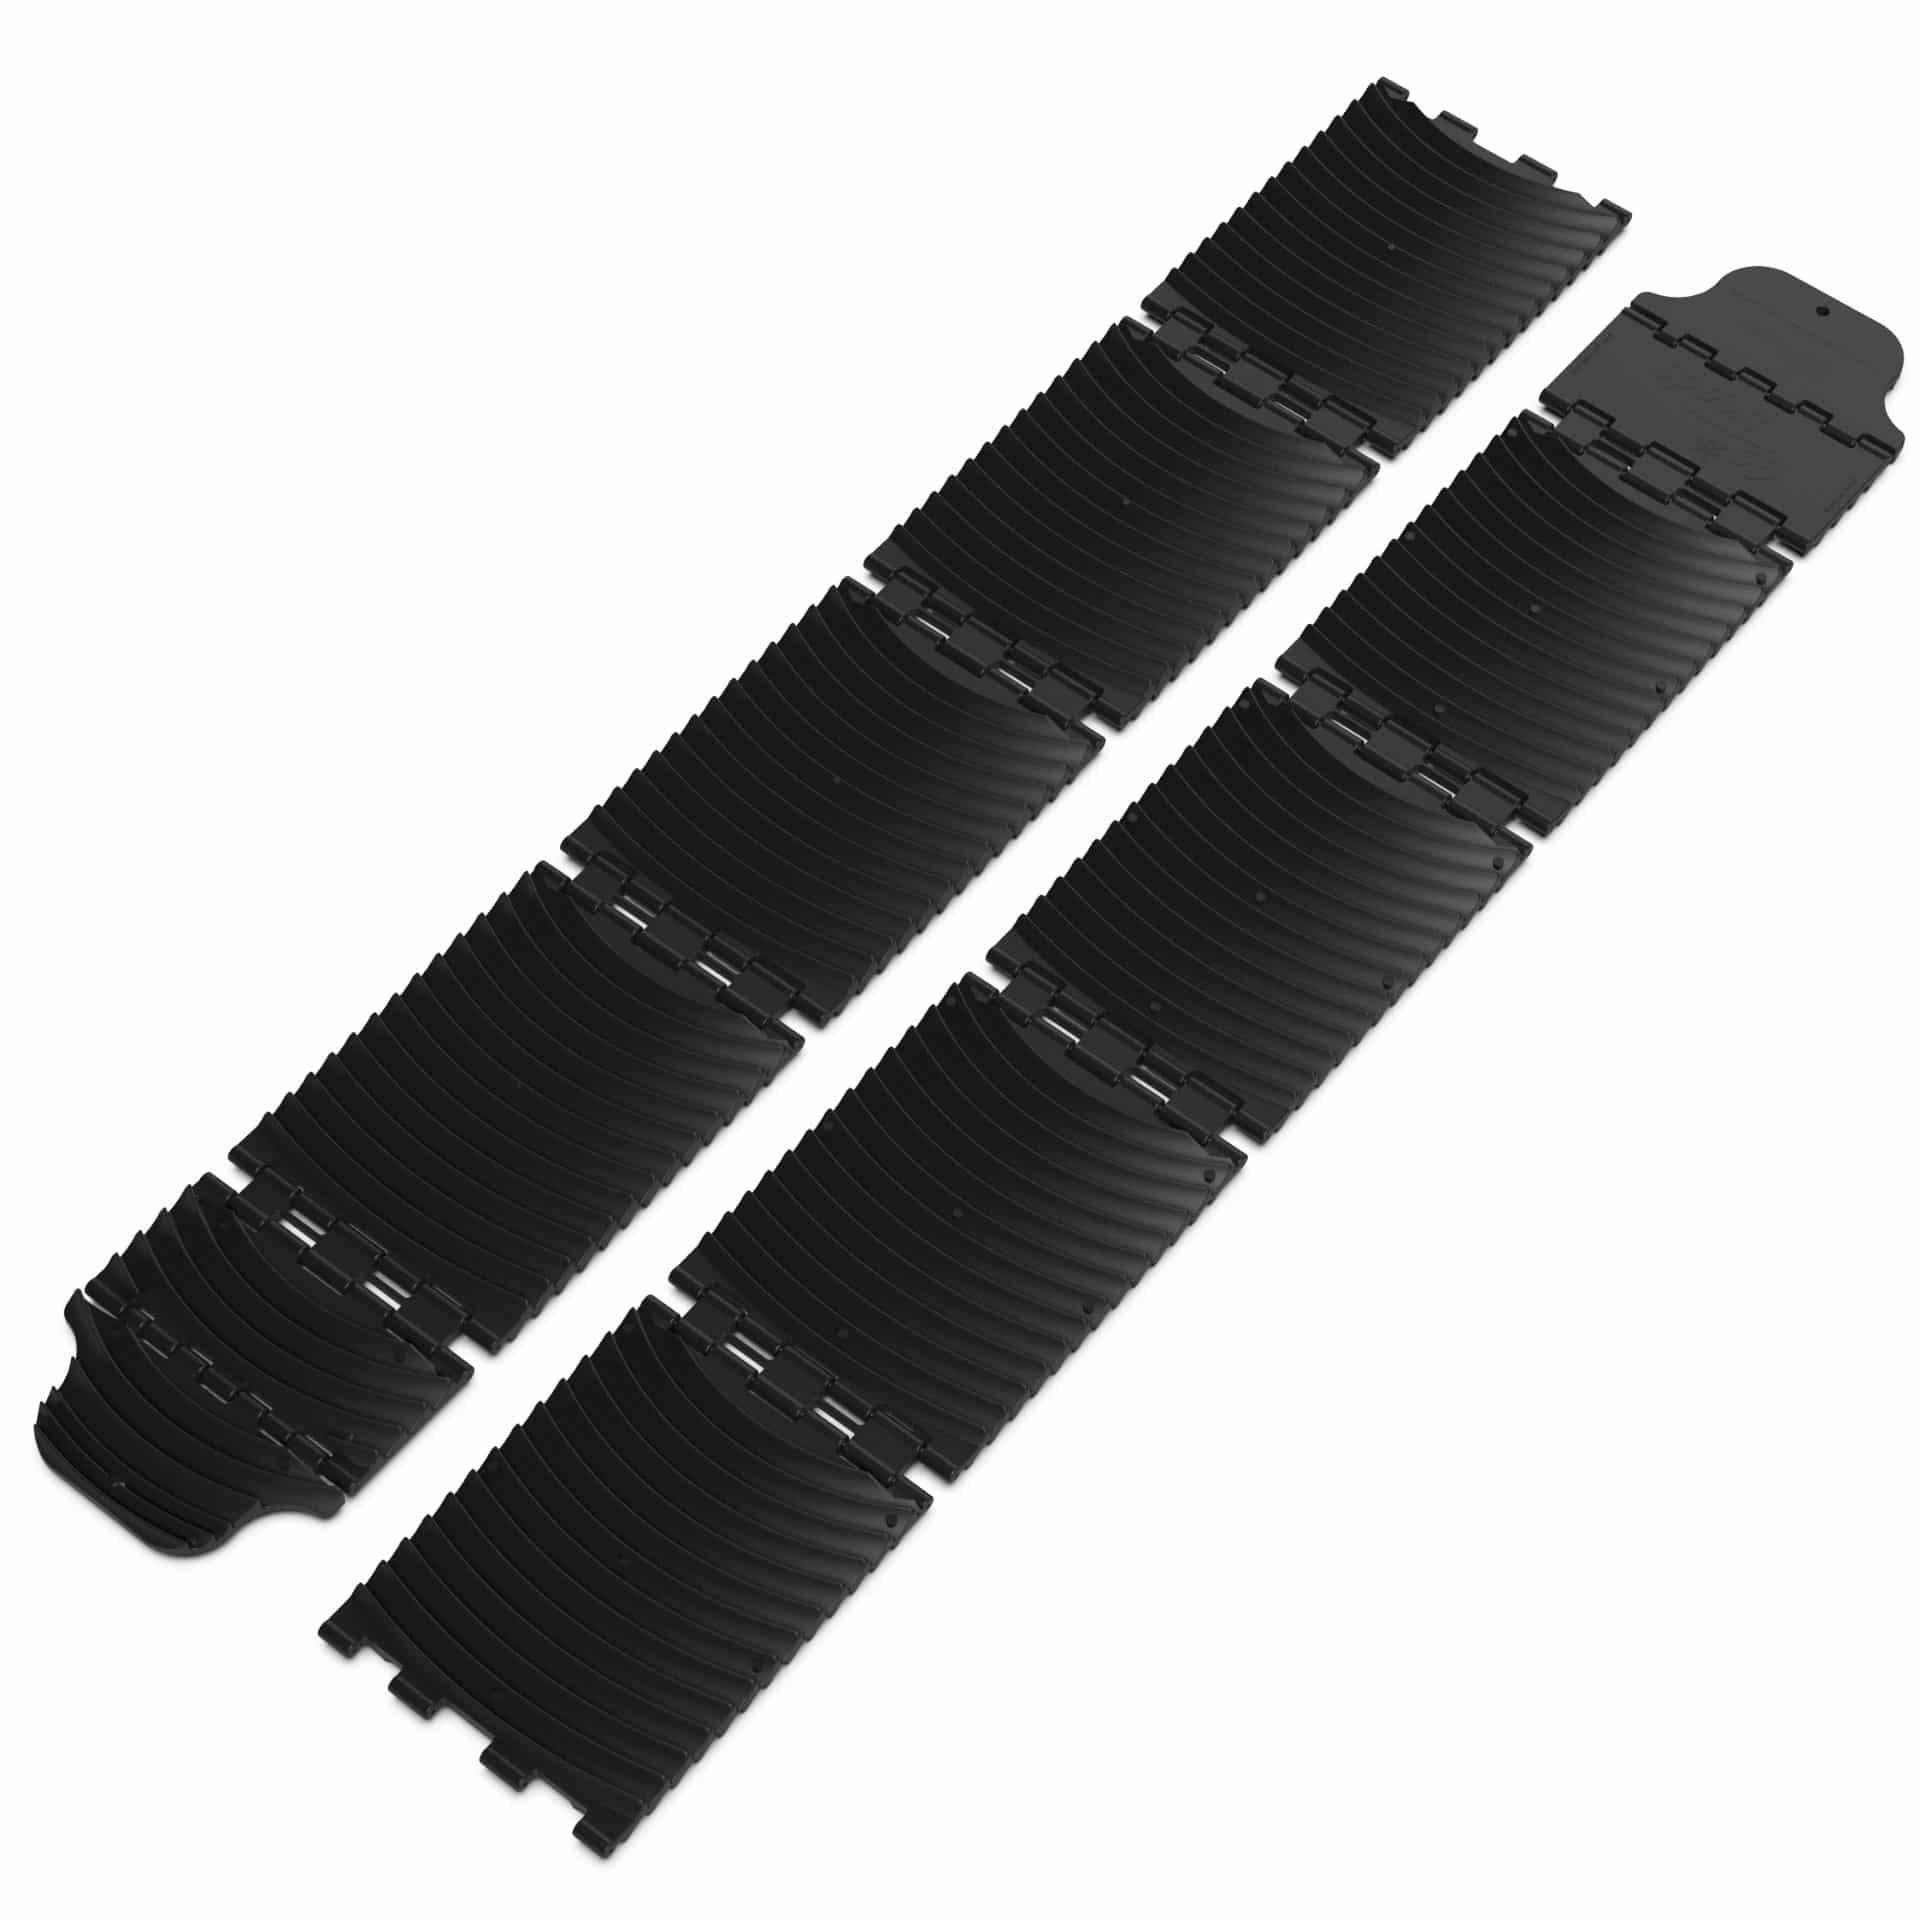 GoTreads XL - Extended Black